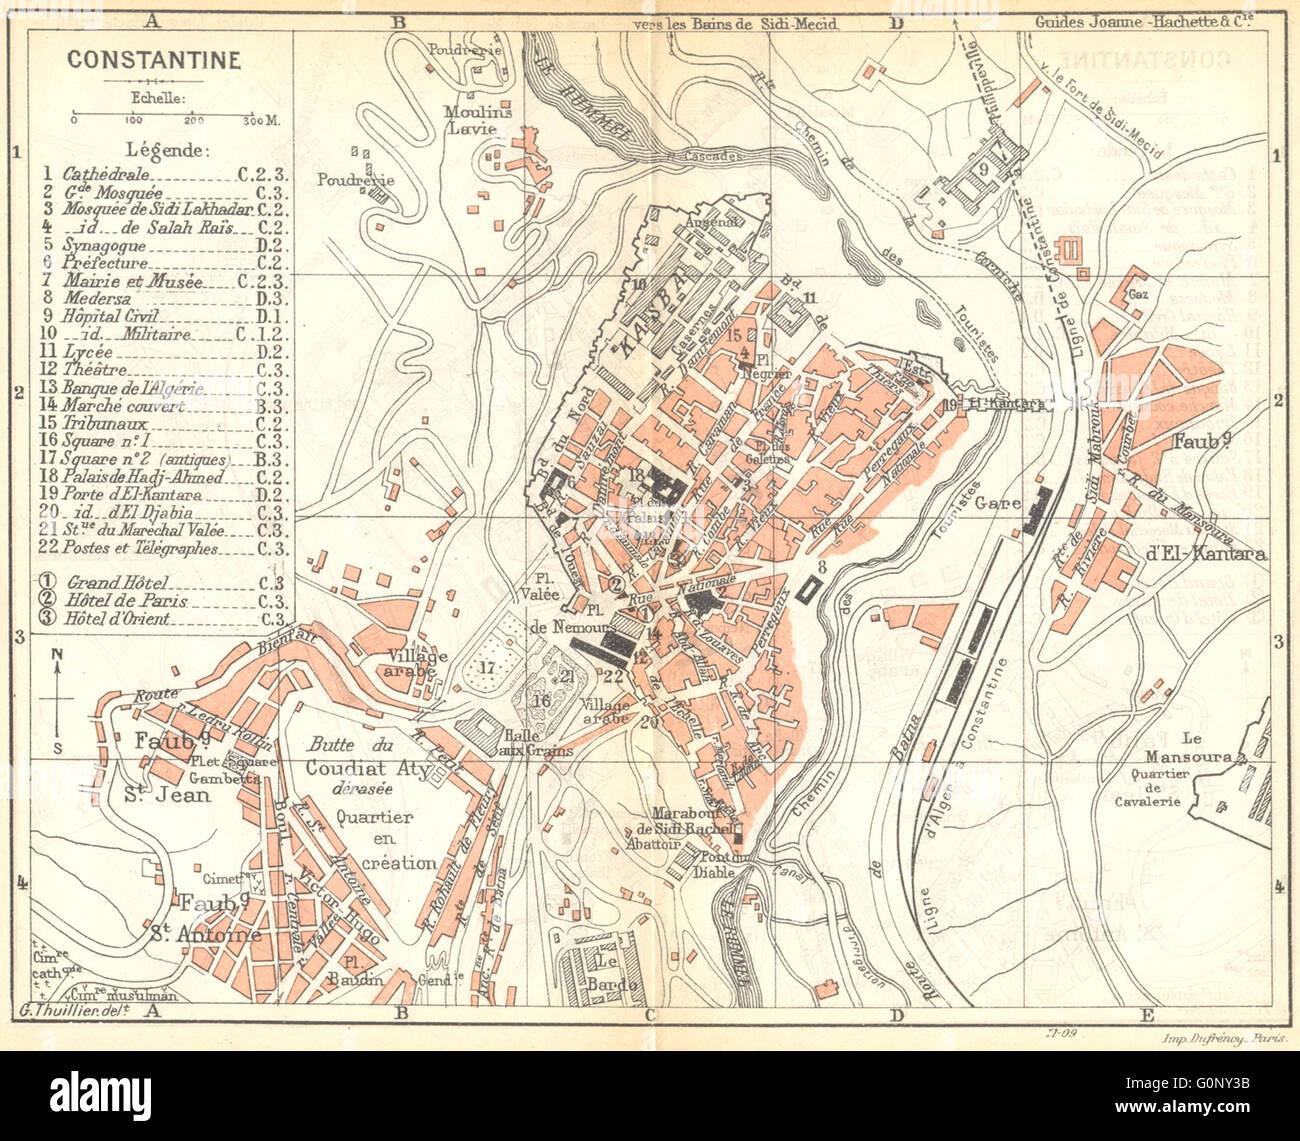 ALGERIA Constantine 1909 antique map Stock Photo Royalty Free